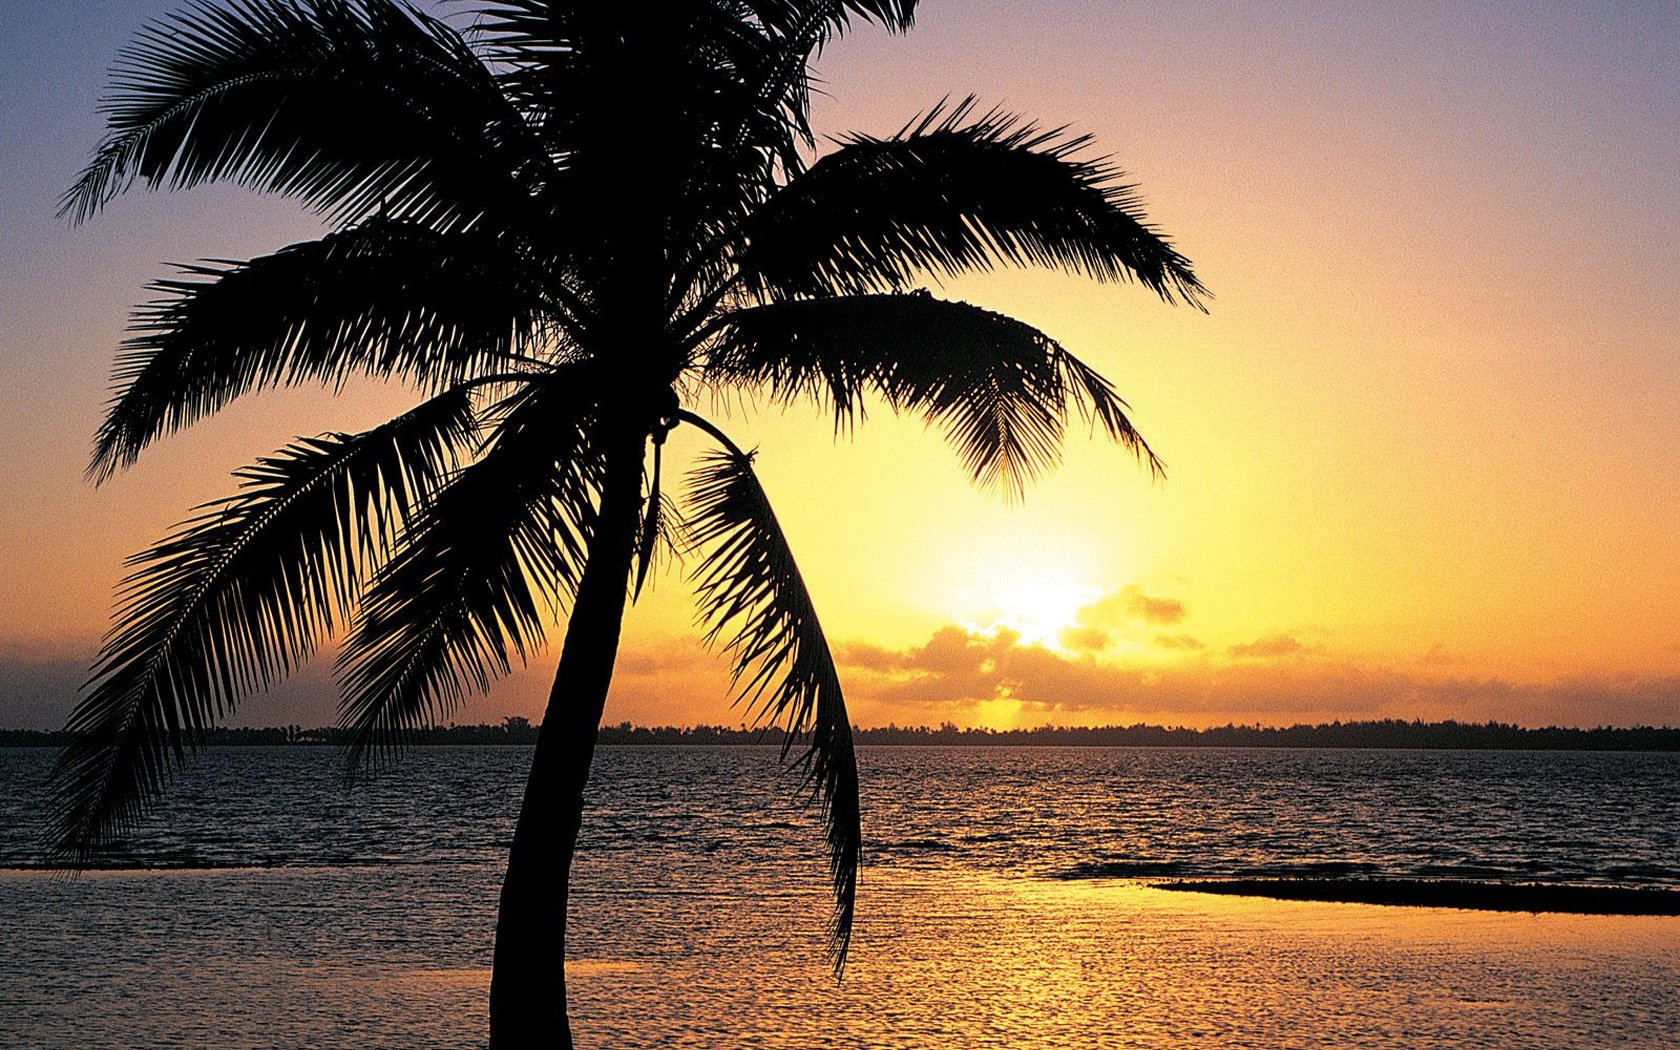 Tropical-island-sunset_1680x1050_60065